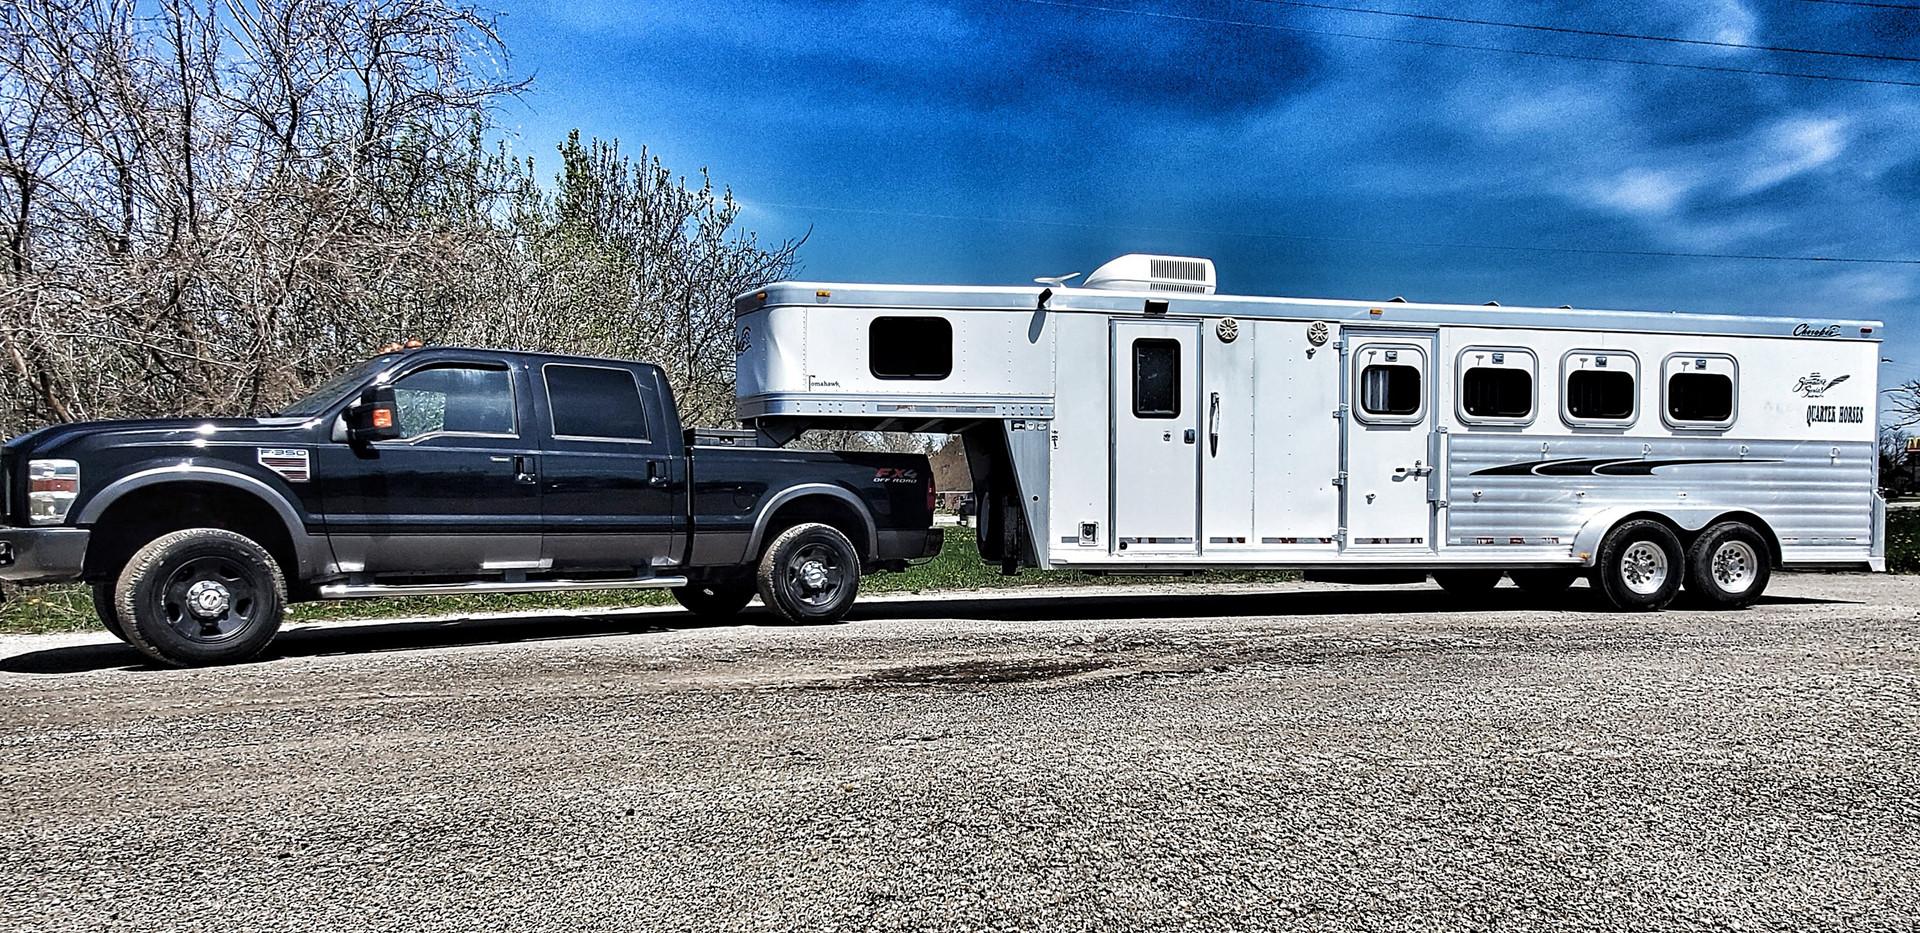 Our 4 Horse LQ rig